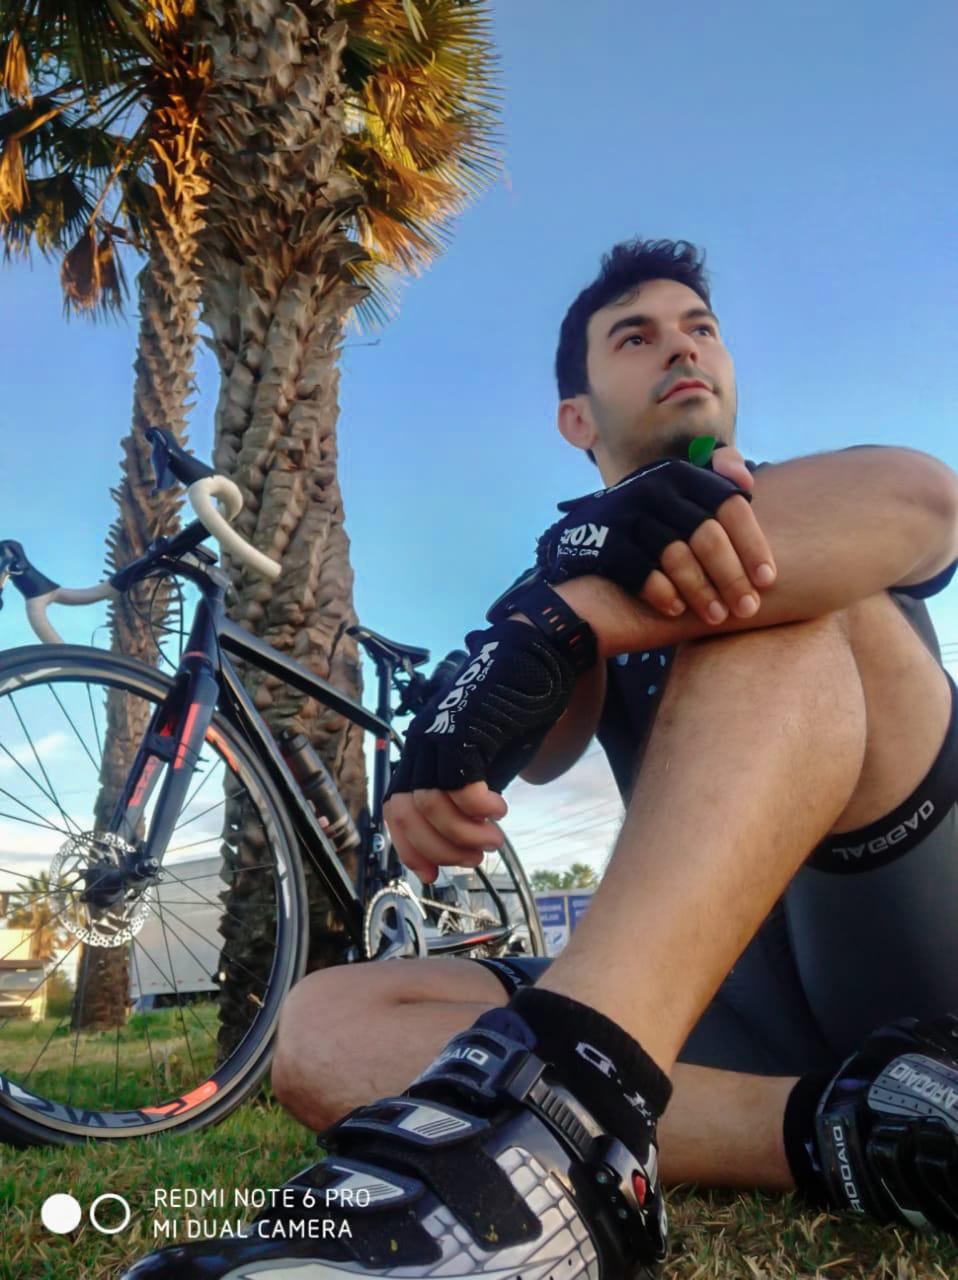 Professor se reinventa e cria assessoria online de bike indoor